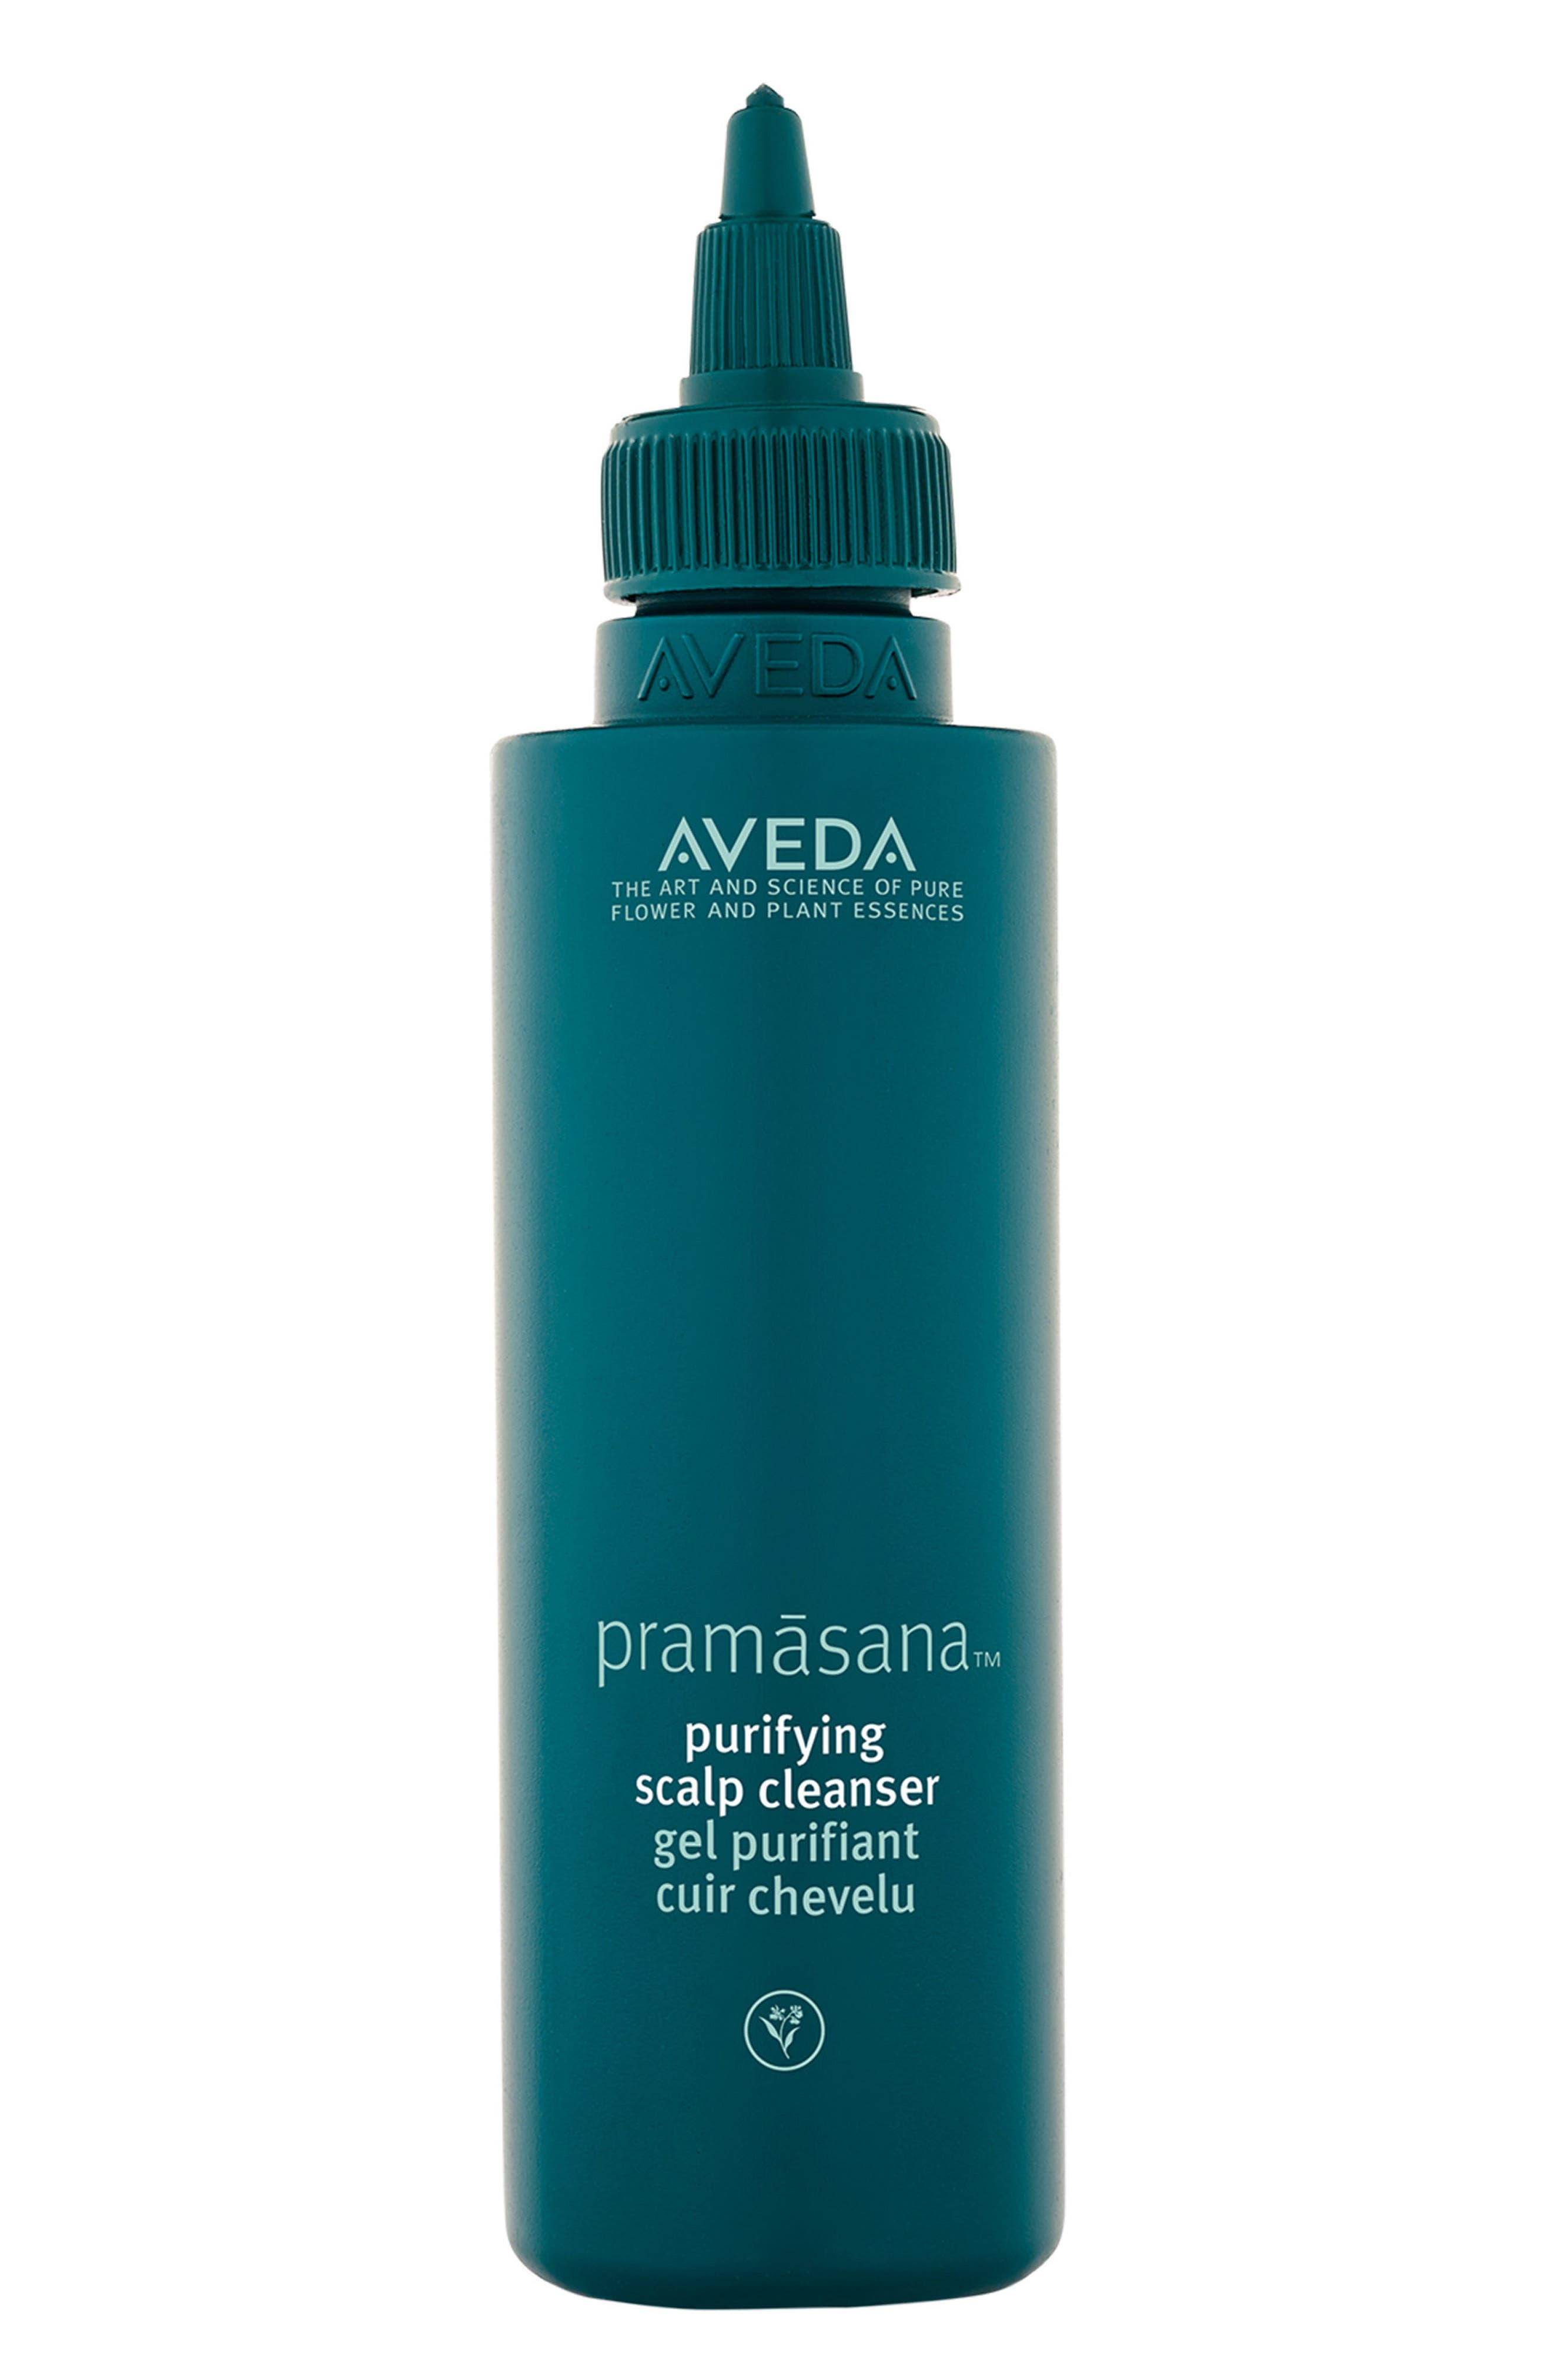 Pramasana(TM) Purifying Scalp Cleanser